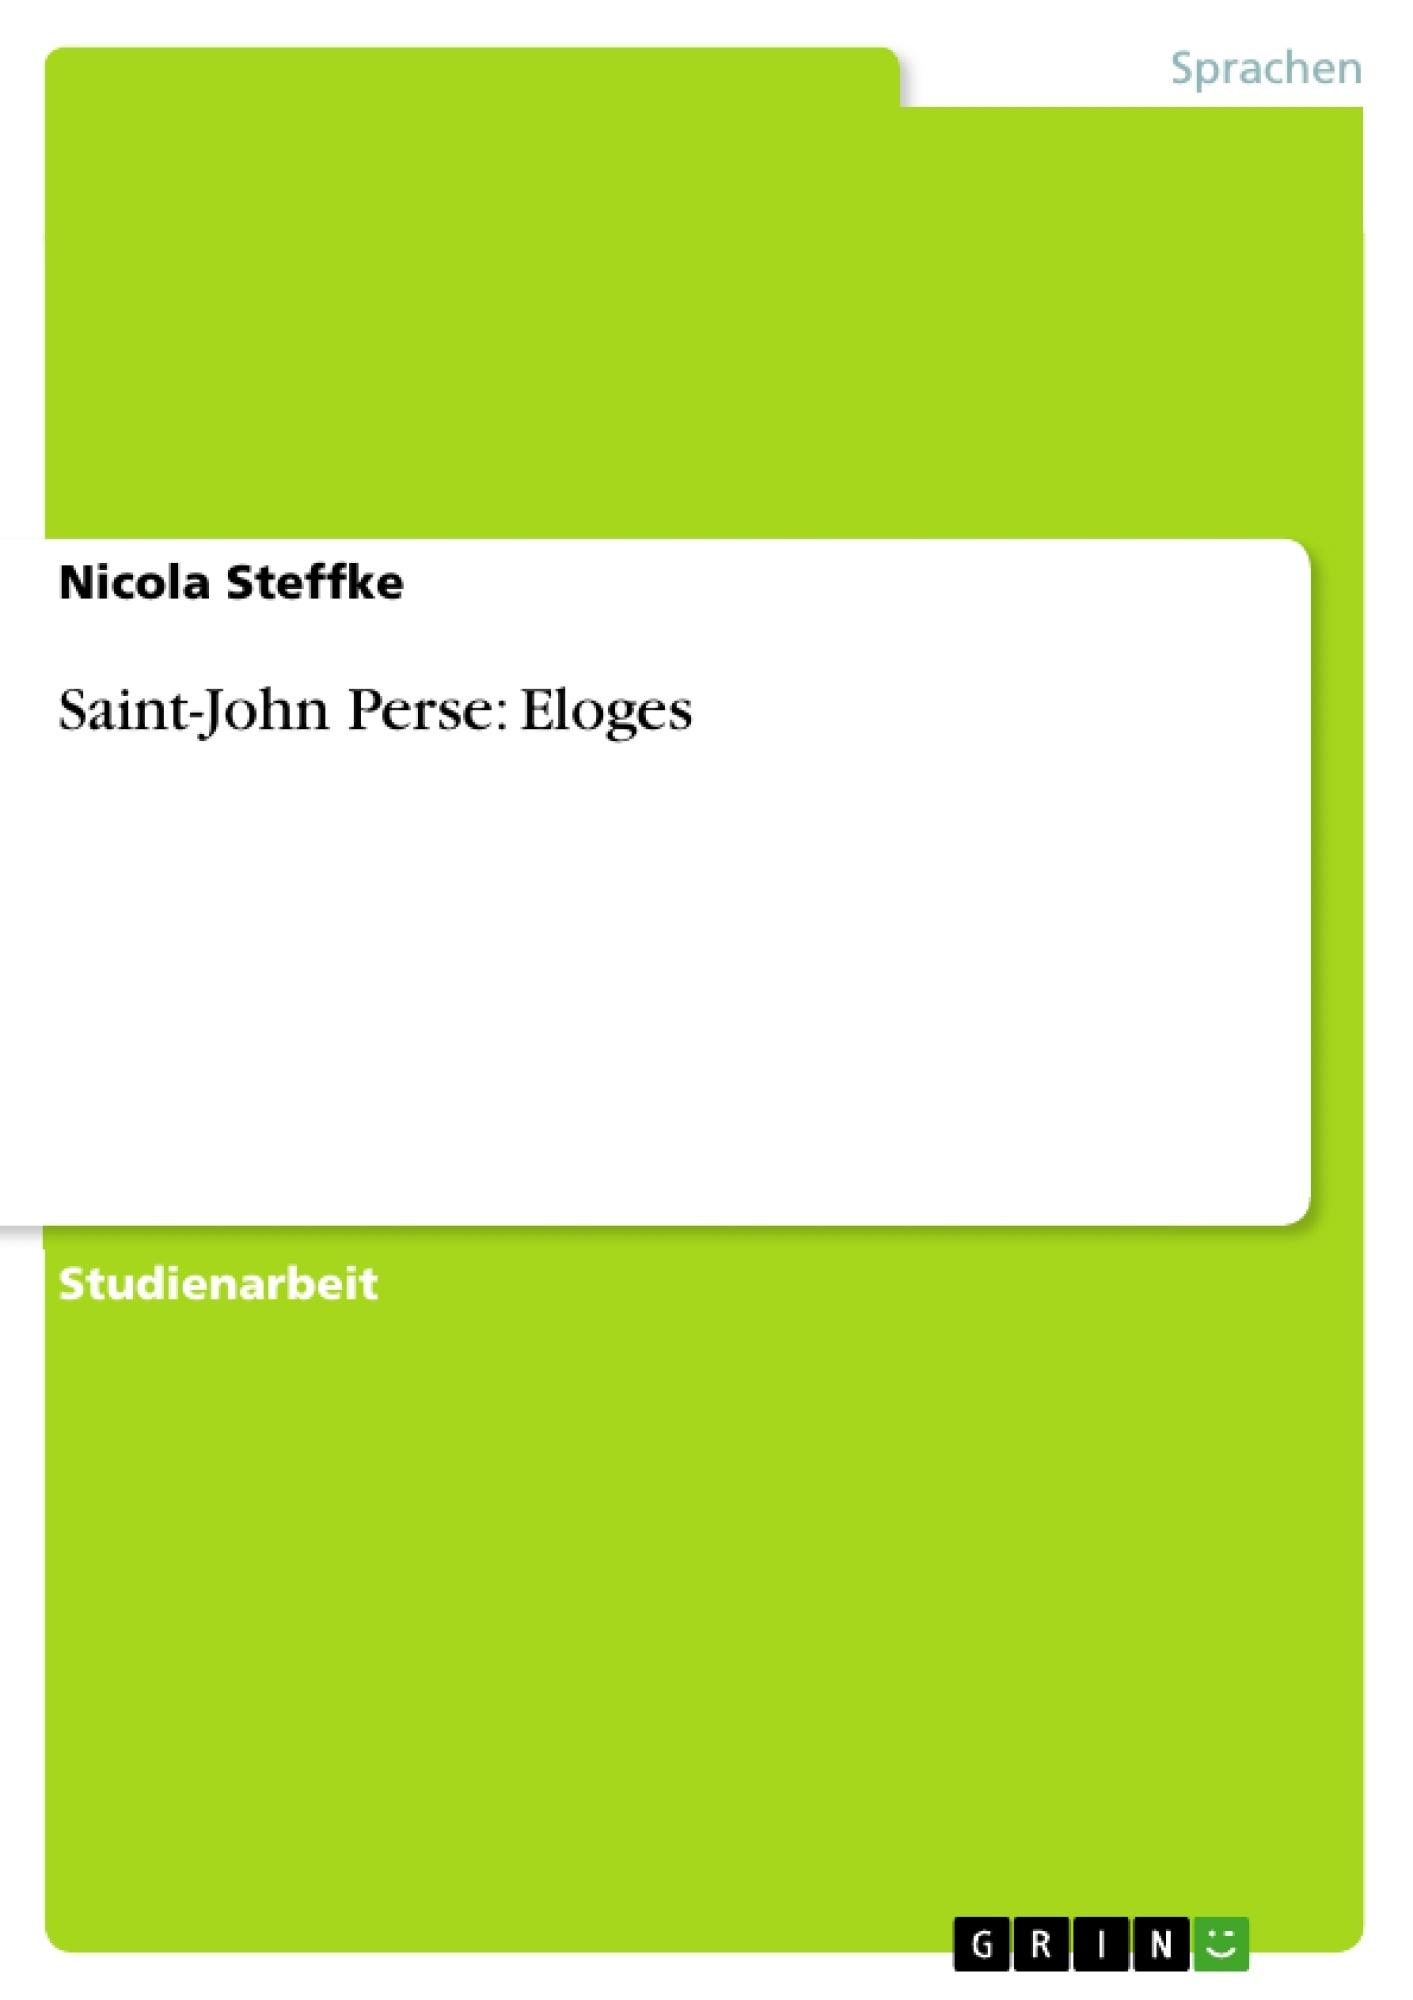 Titel: Saint-John Perse: Eloges